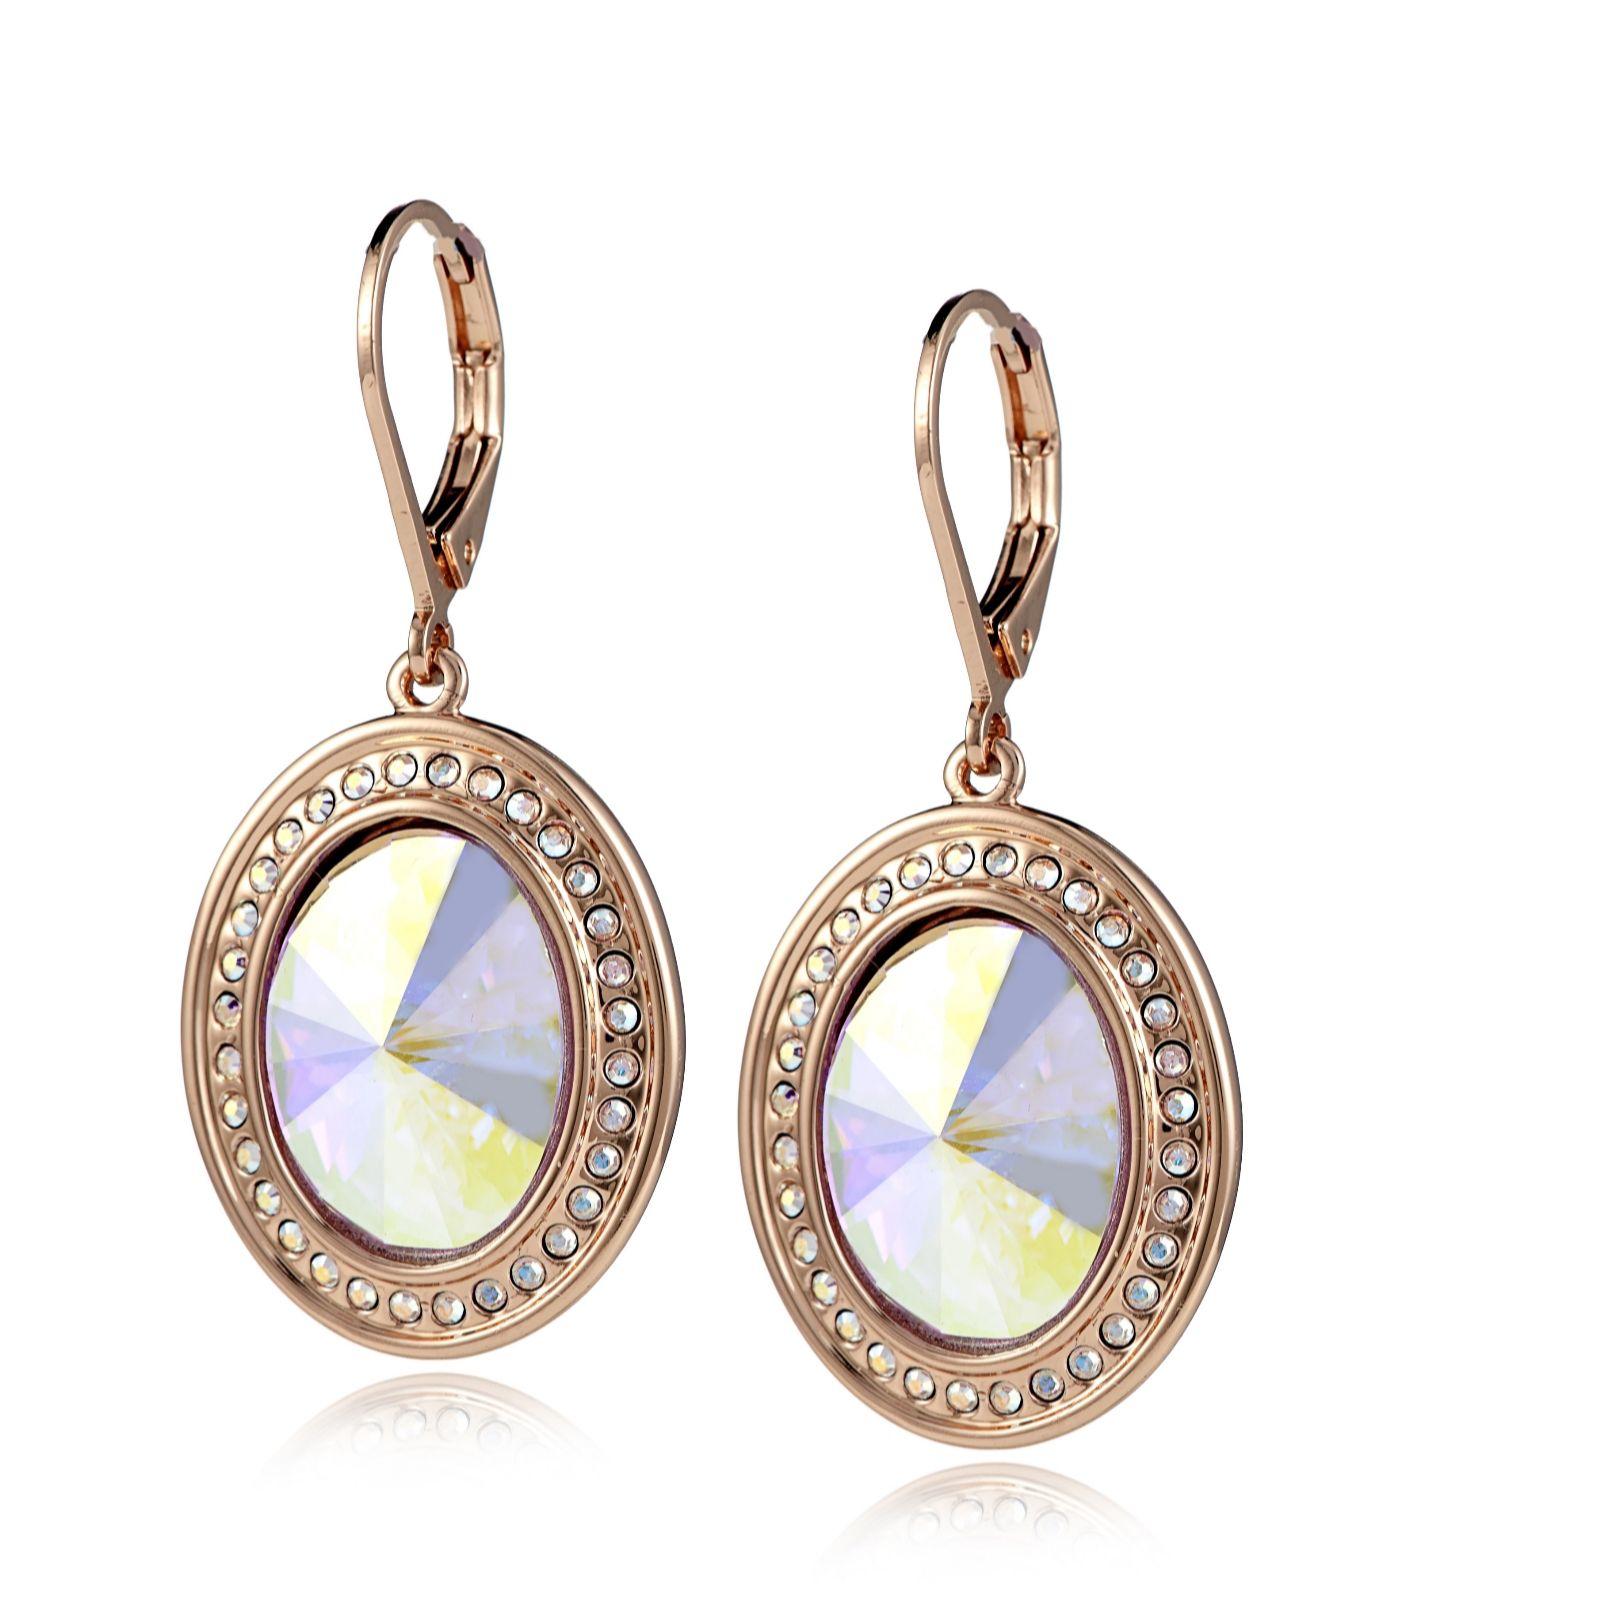 069c7fe2c Aurora Swarovski Crystal Rivoli Leverback Earrings - QVC UK